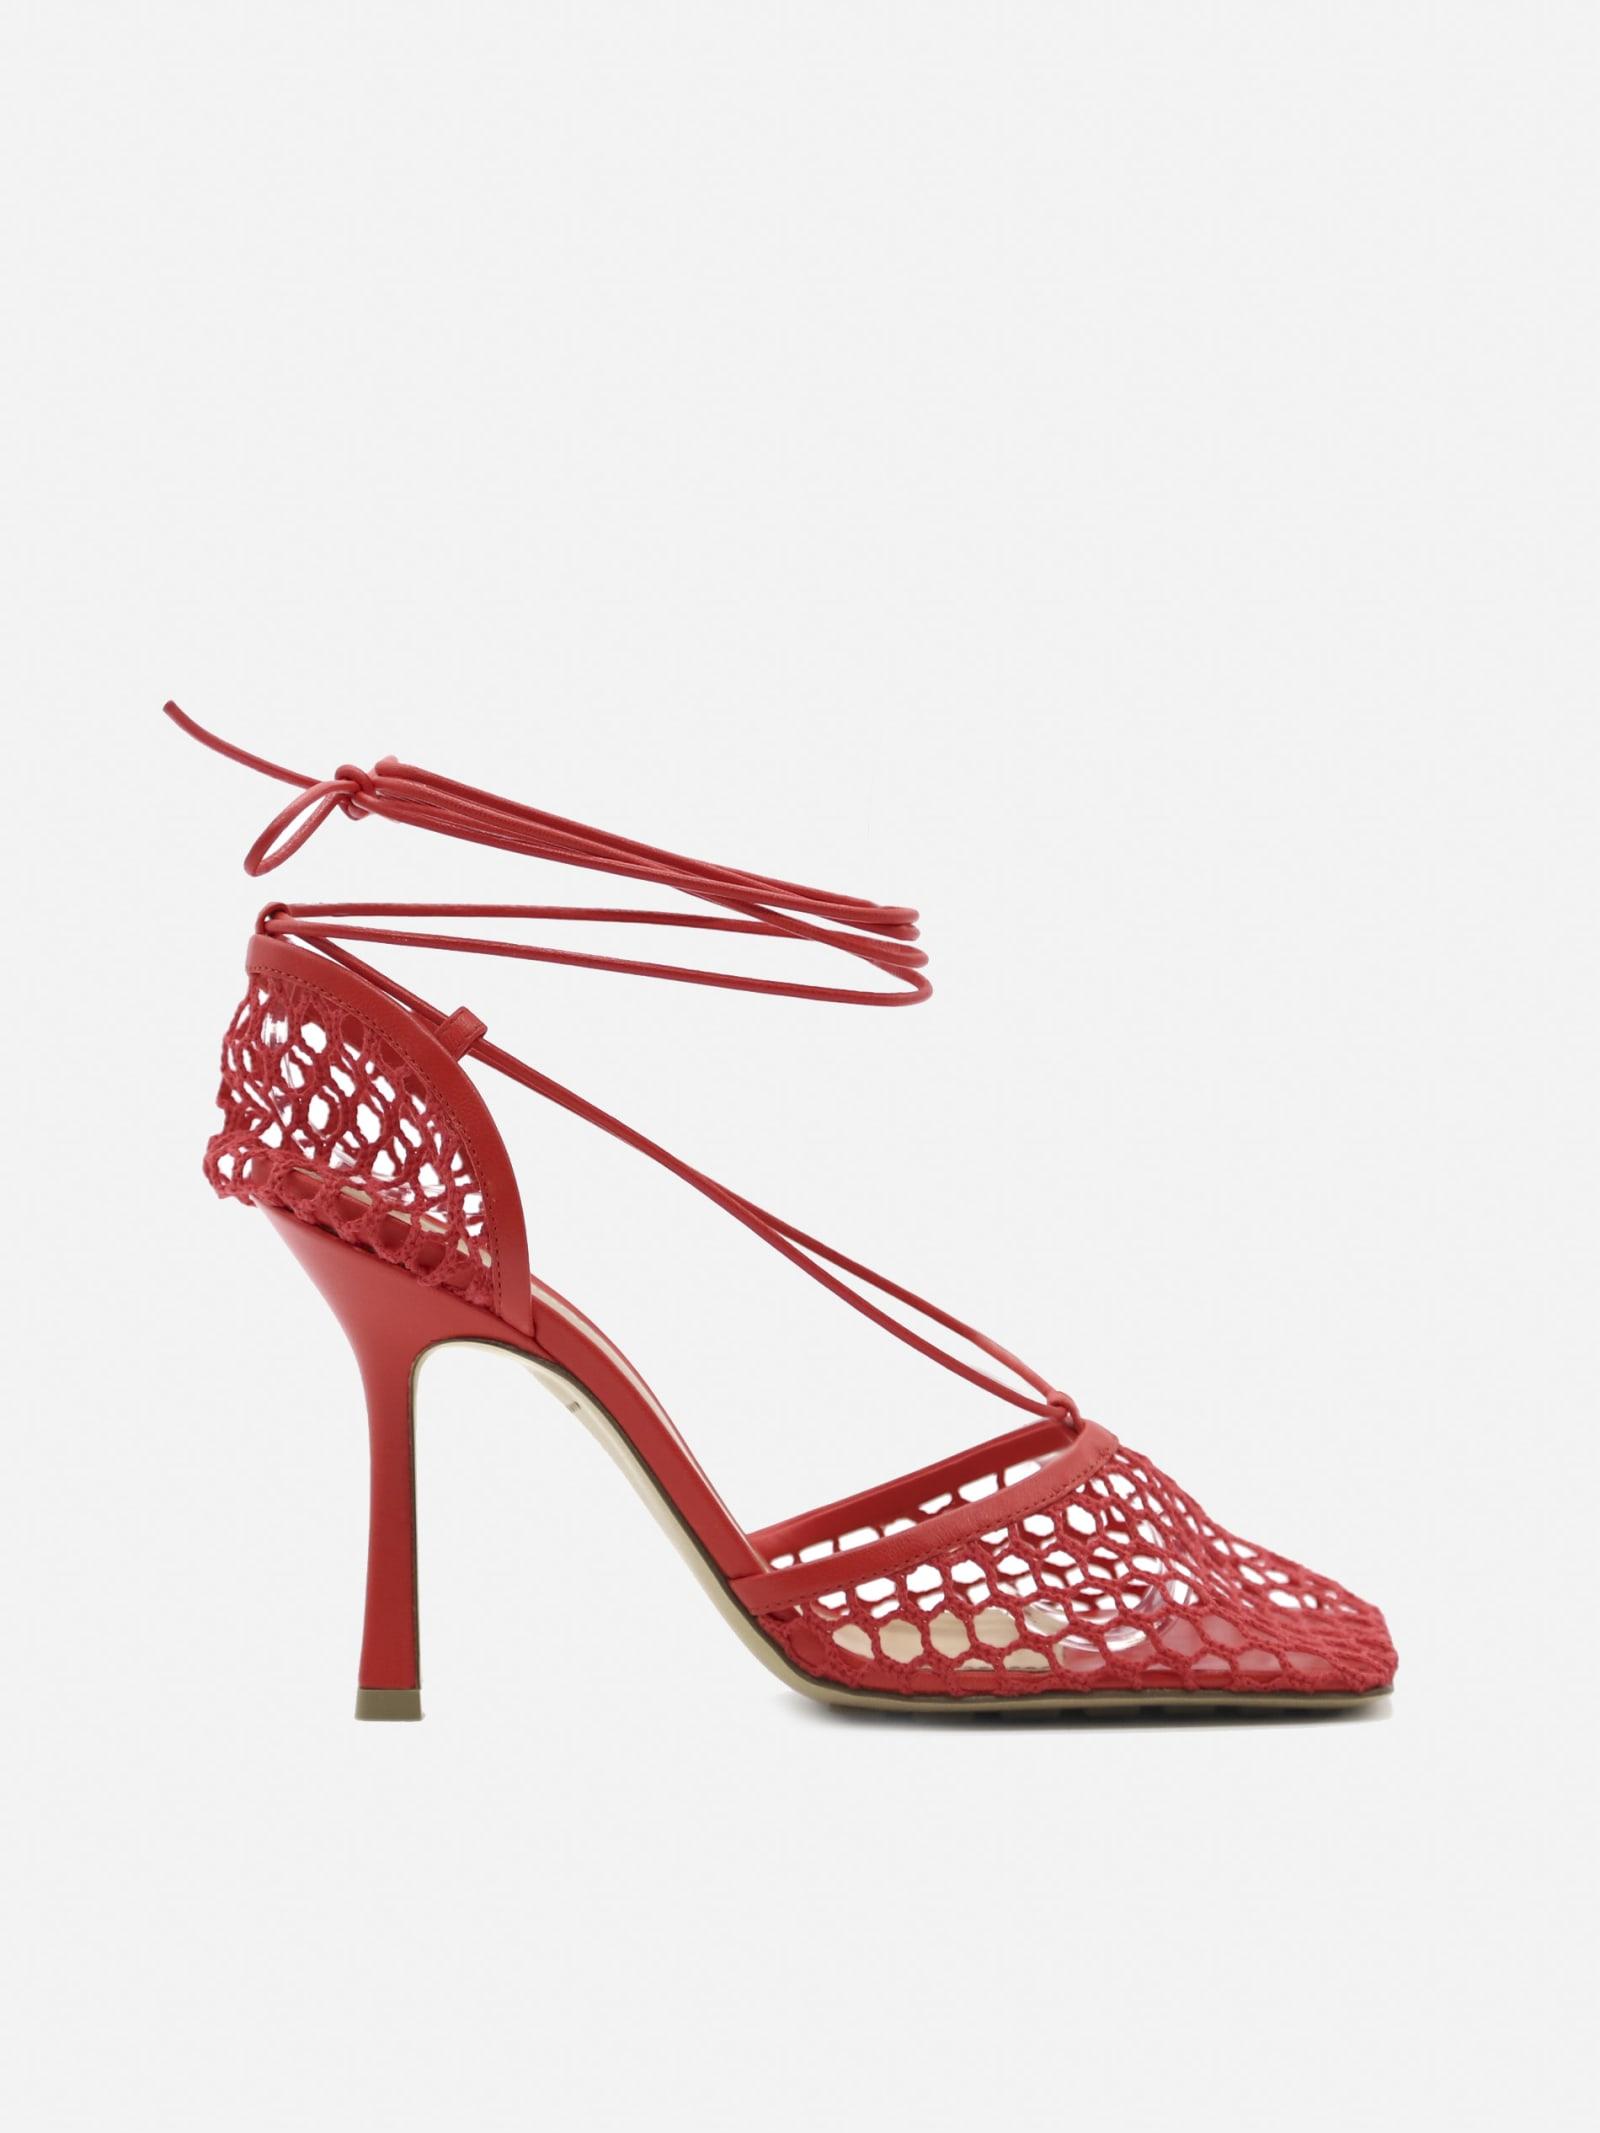 Buy Bottega Veneta Stretch Leather Sandals online, shop Bottega Veneta shoes with free shipping